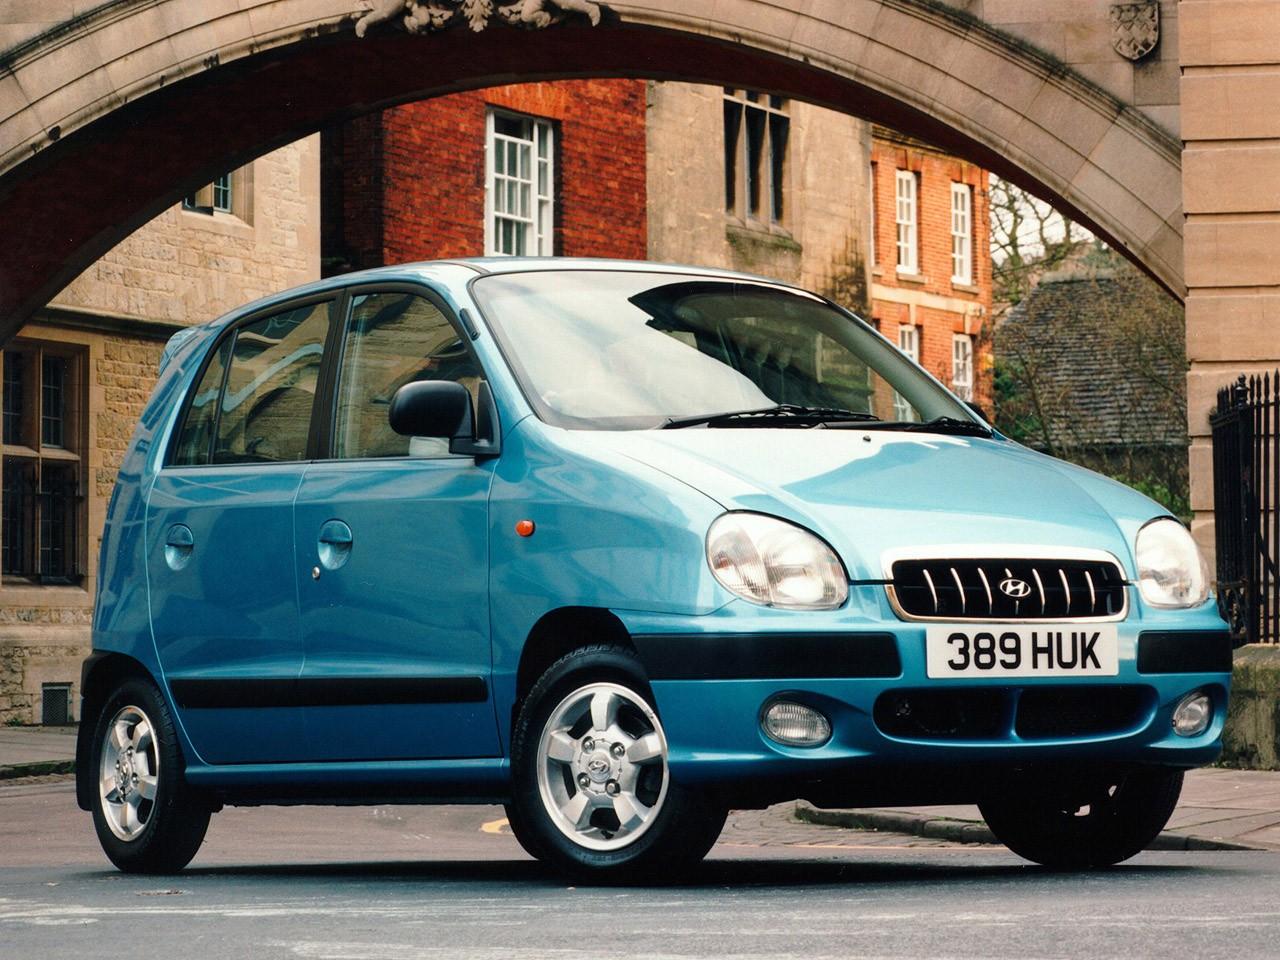 1999 Hyundai Amica